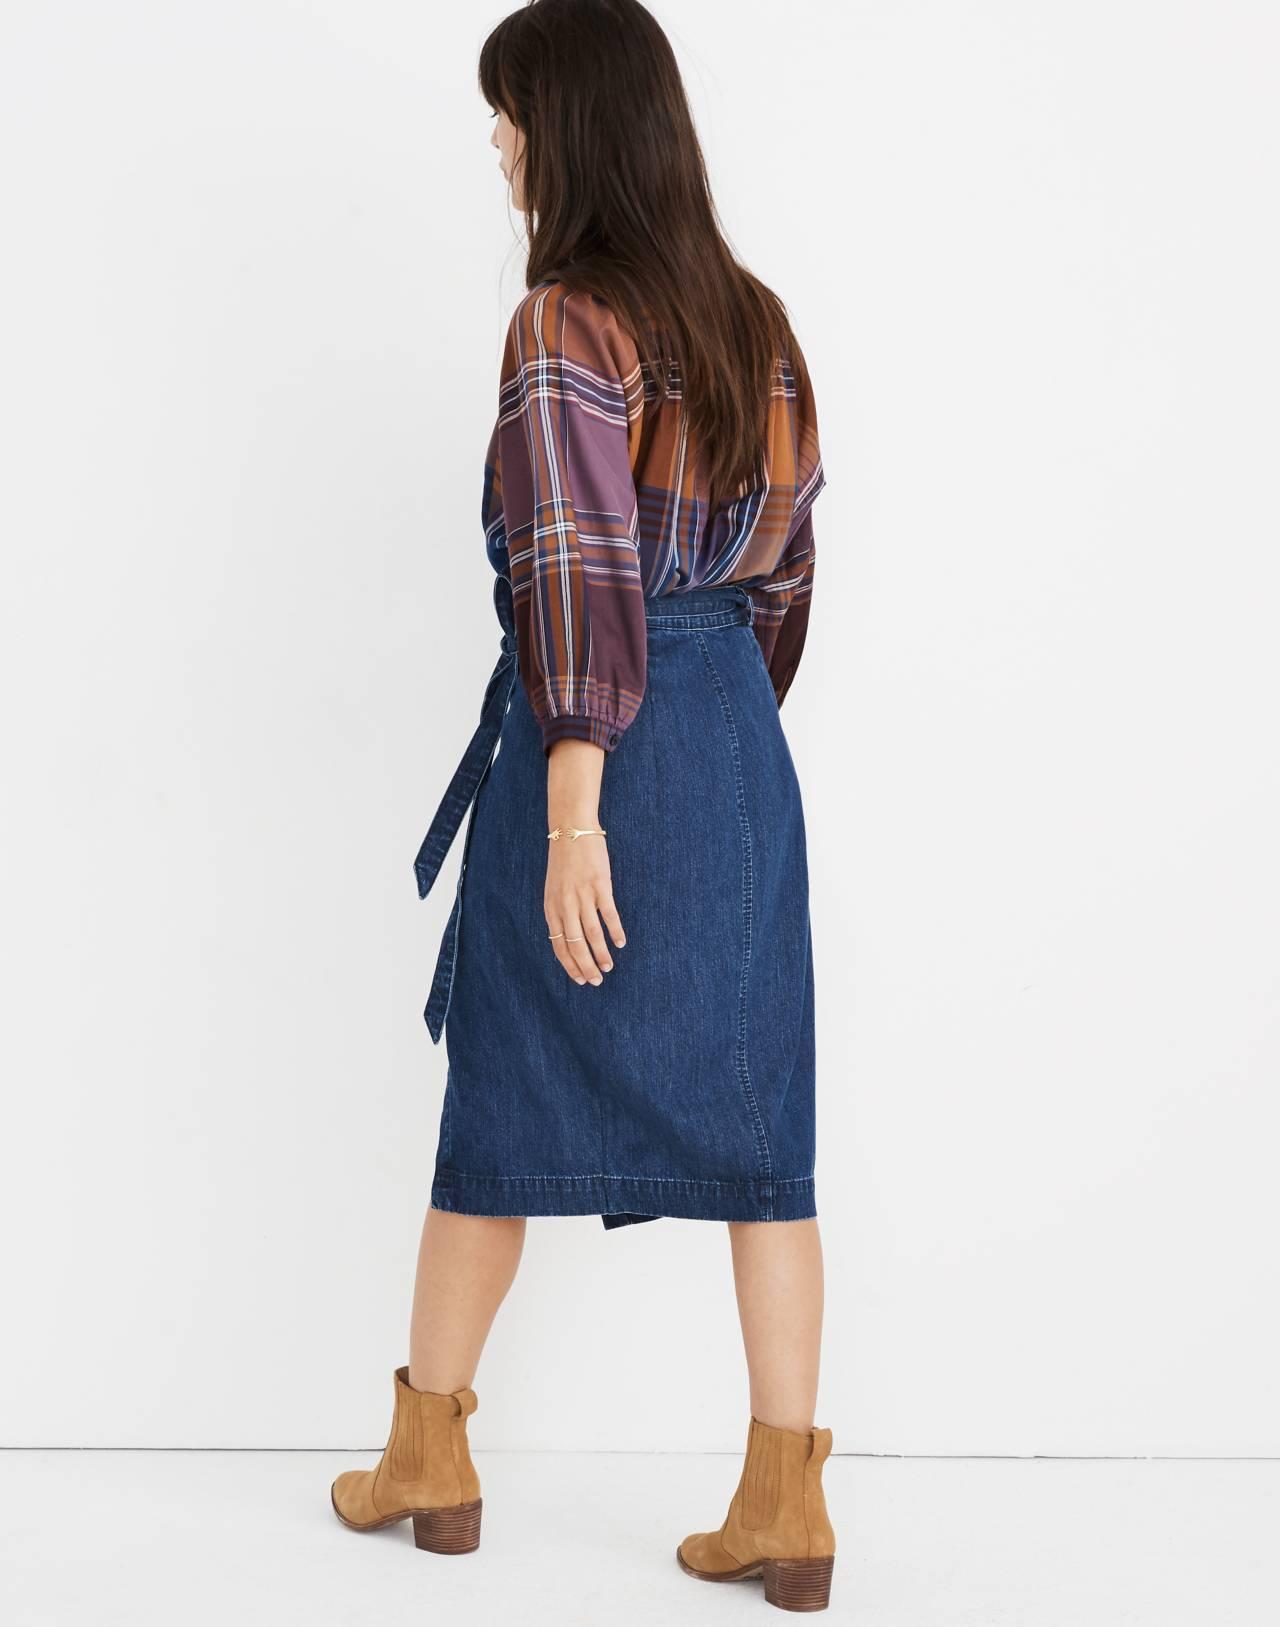 Denim Midi Wrap Skirt in Neville Wash in neville wash image 3